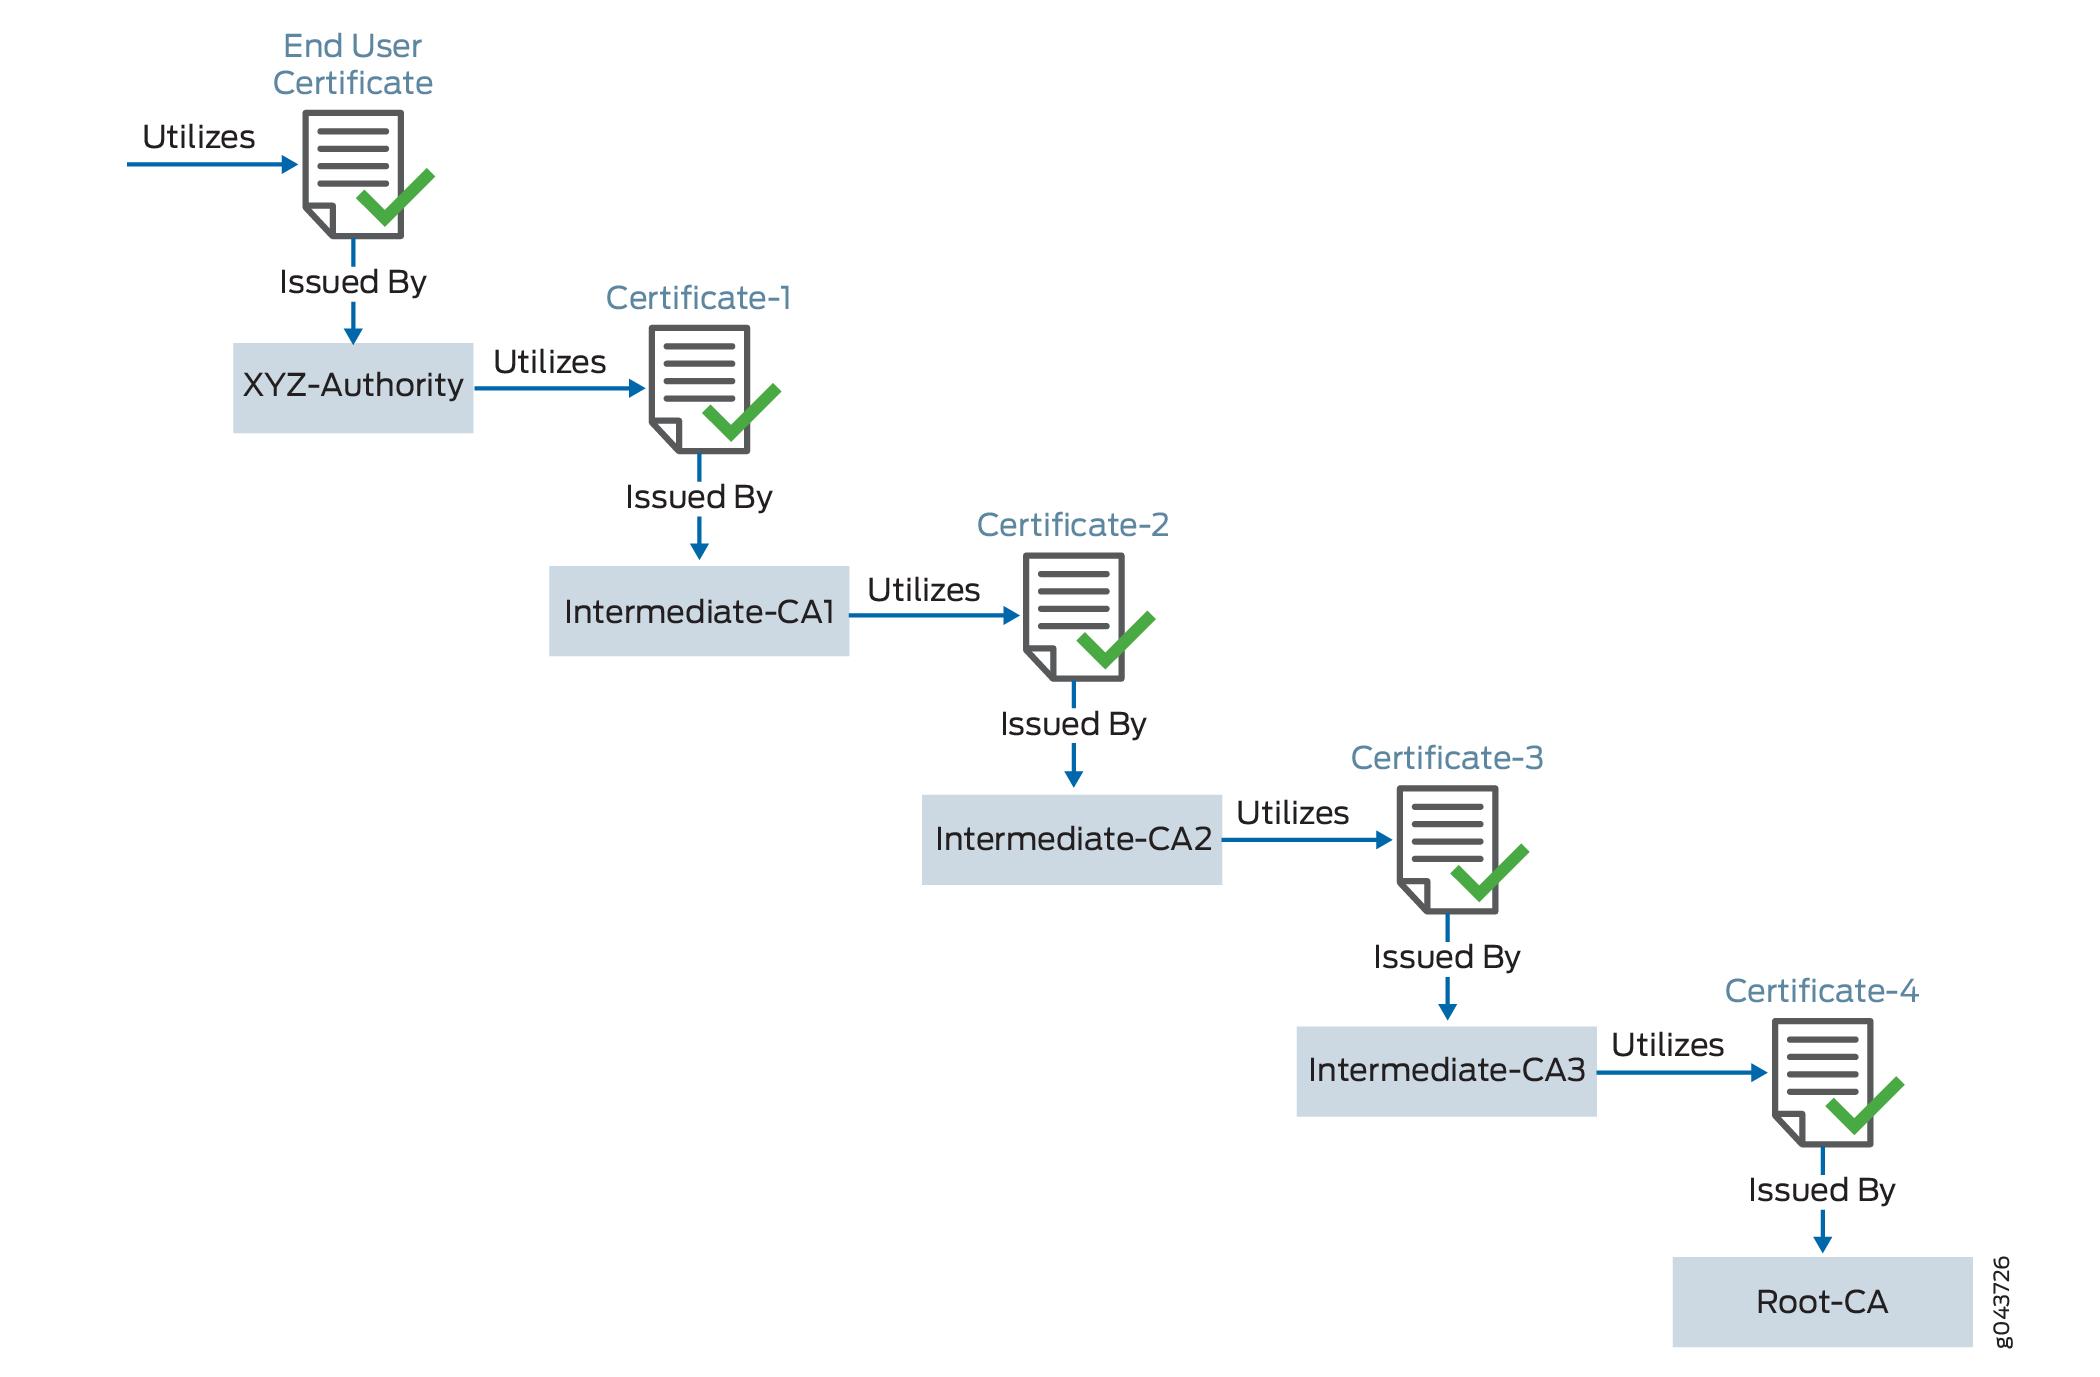 Ssl Proxy Techlibrary Juniper Networks